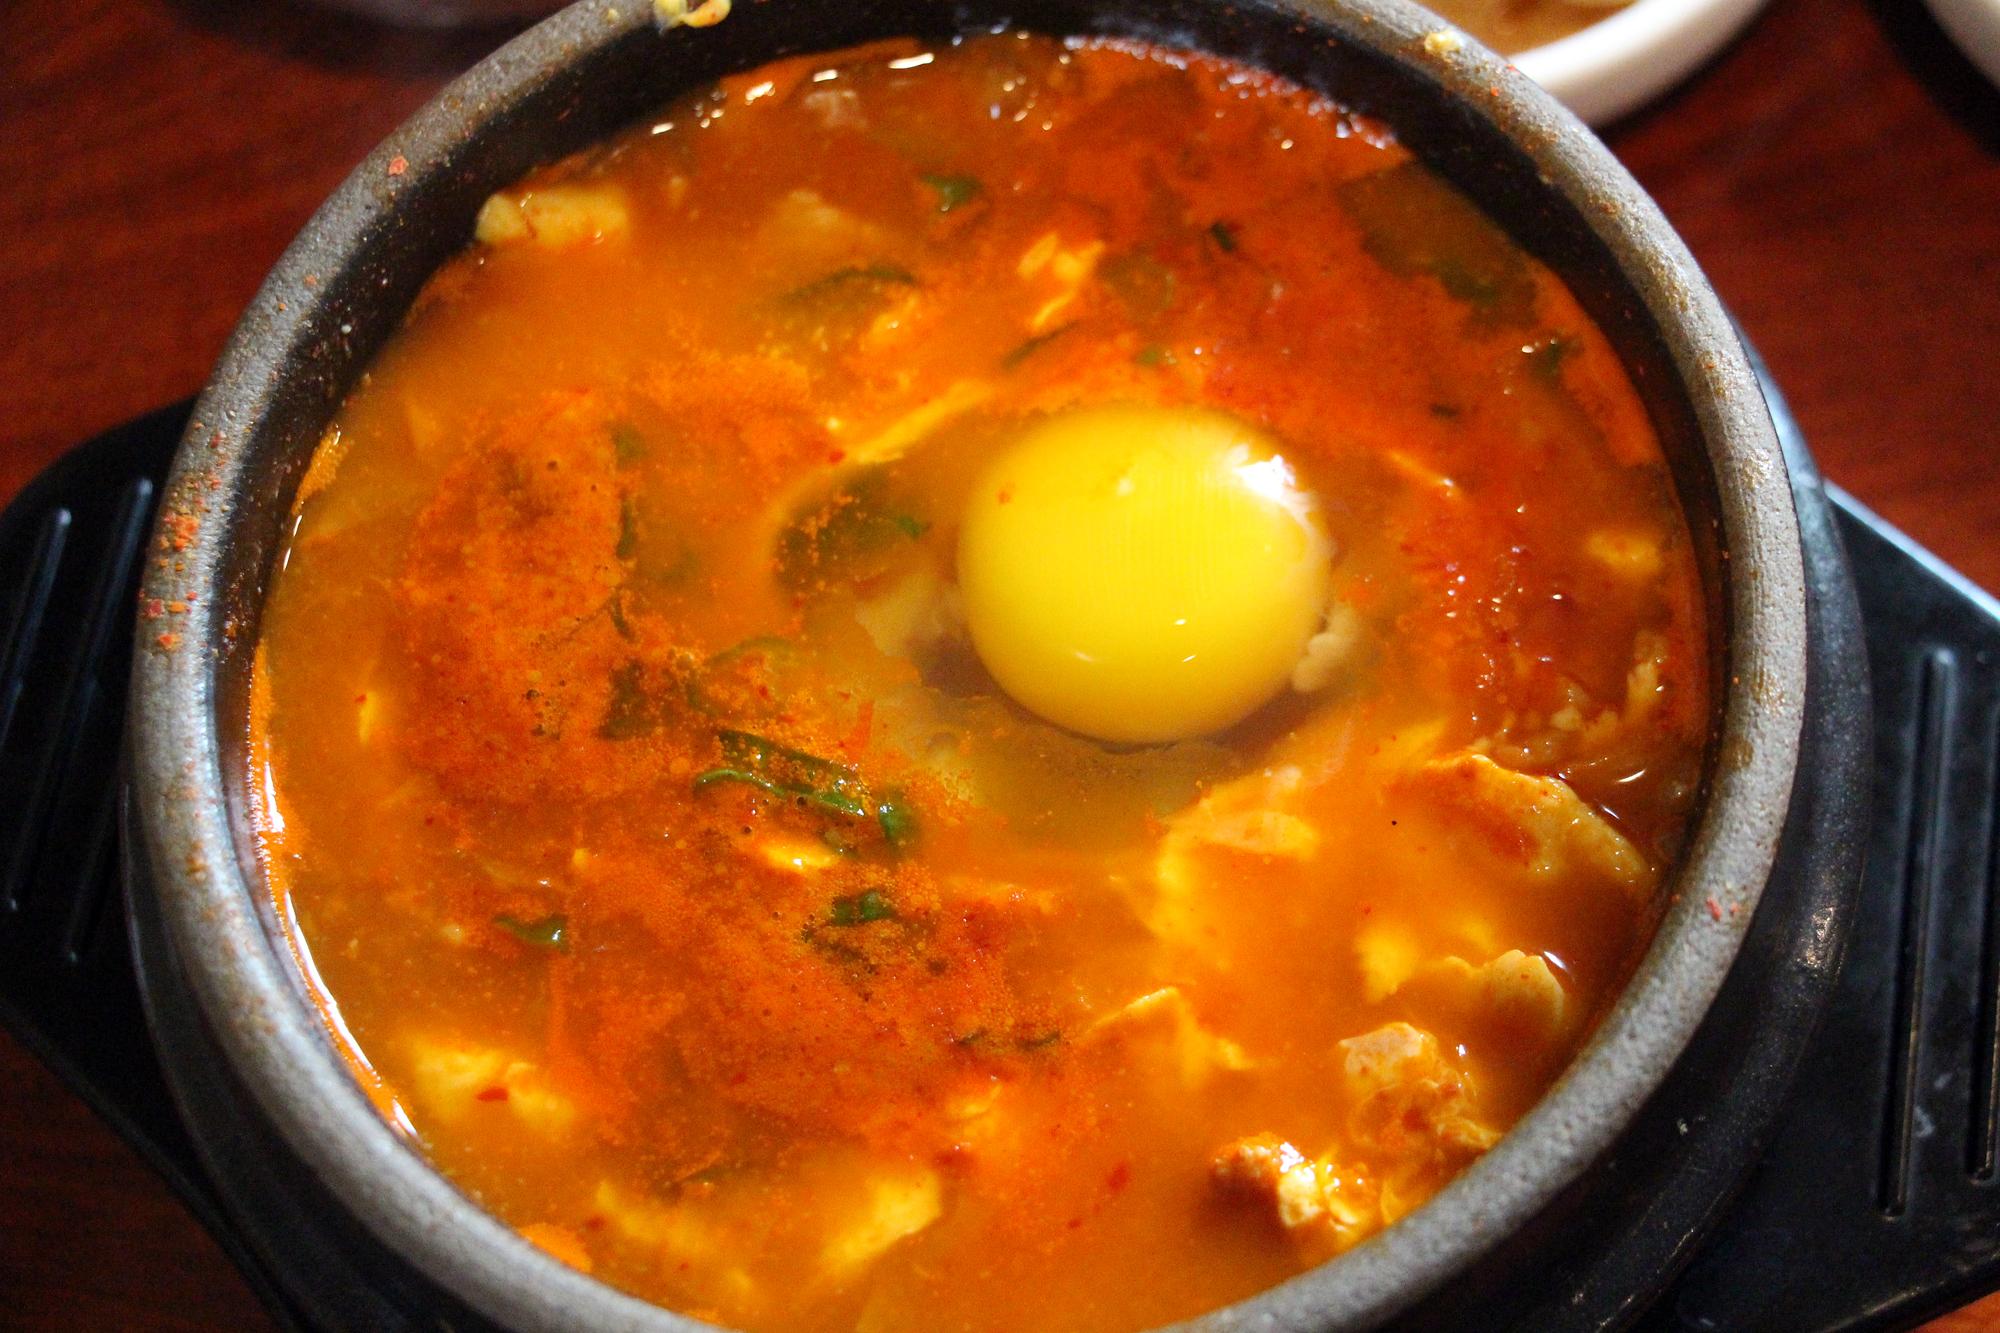 Soft tofu soup with pork, kimchi and a raw egg